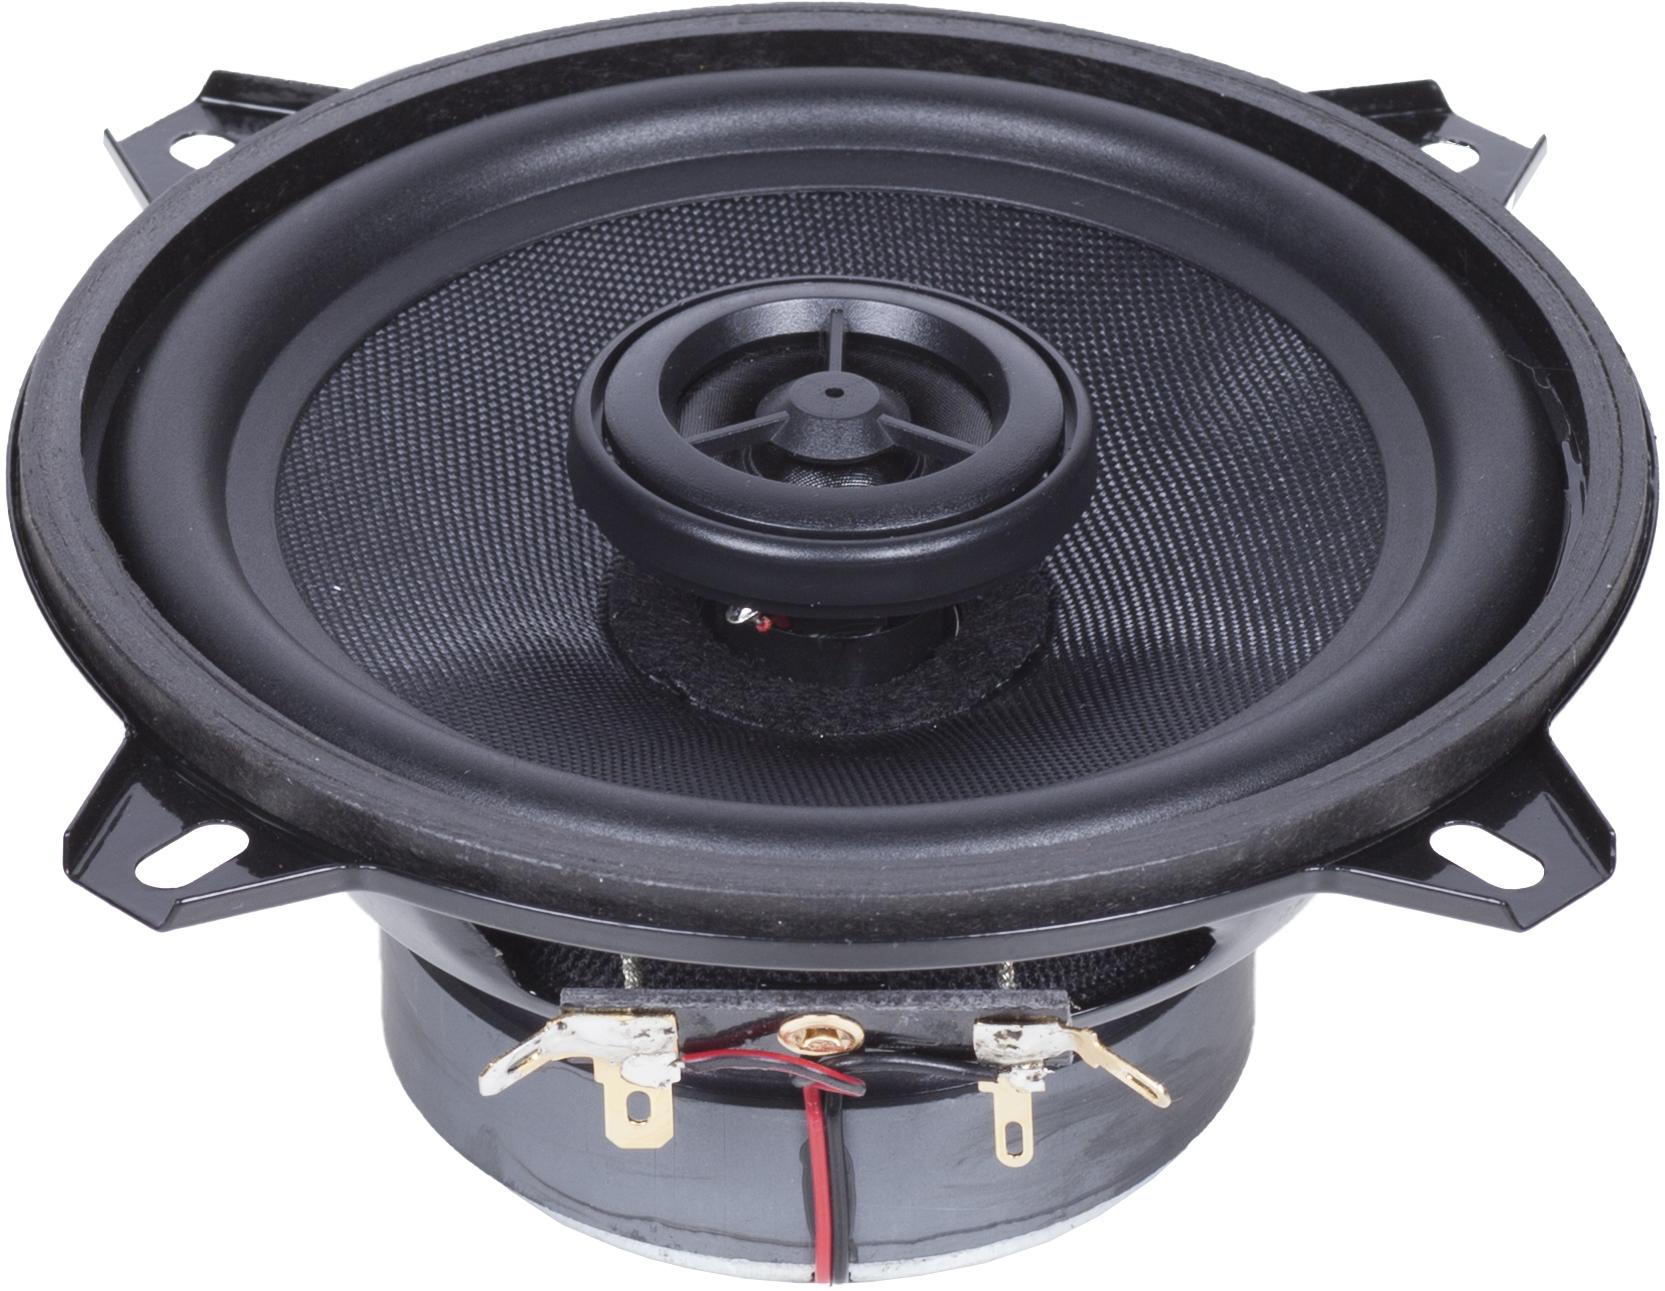 13cm lautsprecher audio system lautsprecher audio. Black Bedroom Furniture Sets. Home Design Ideas